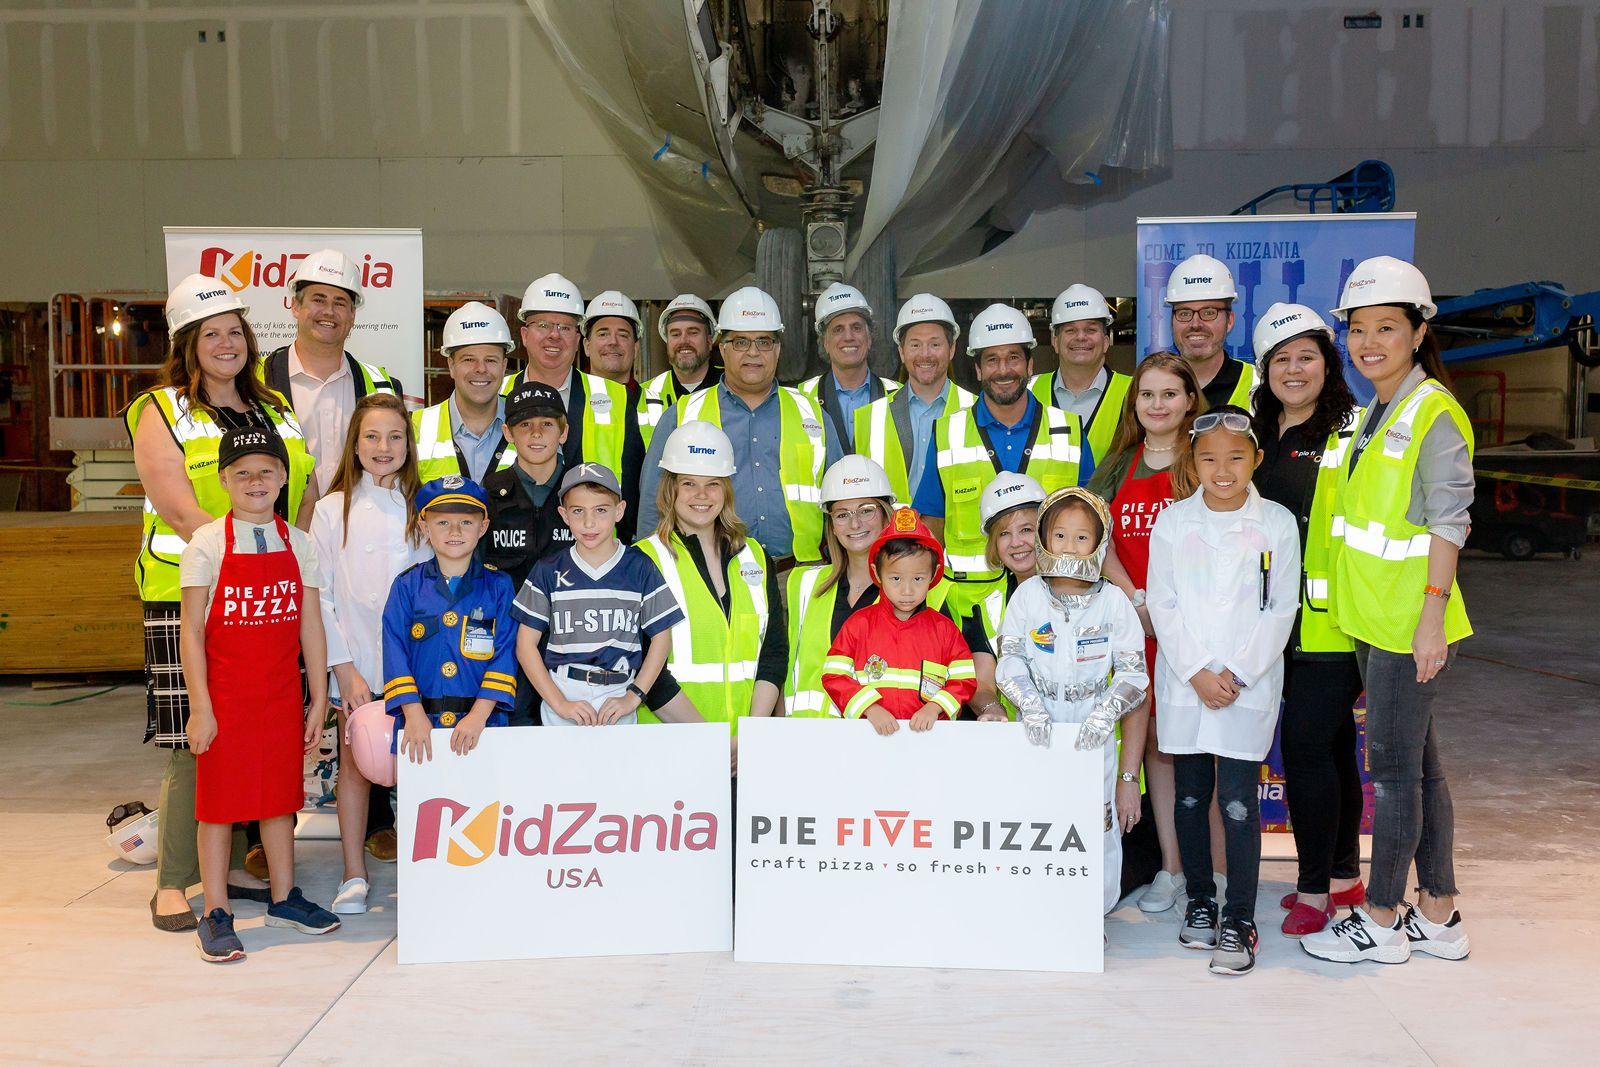 Pie Five Partners with Leading Global Interactive Children's City, KidZania